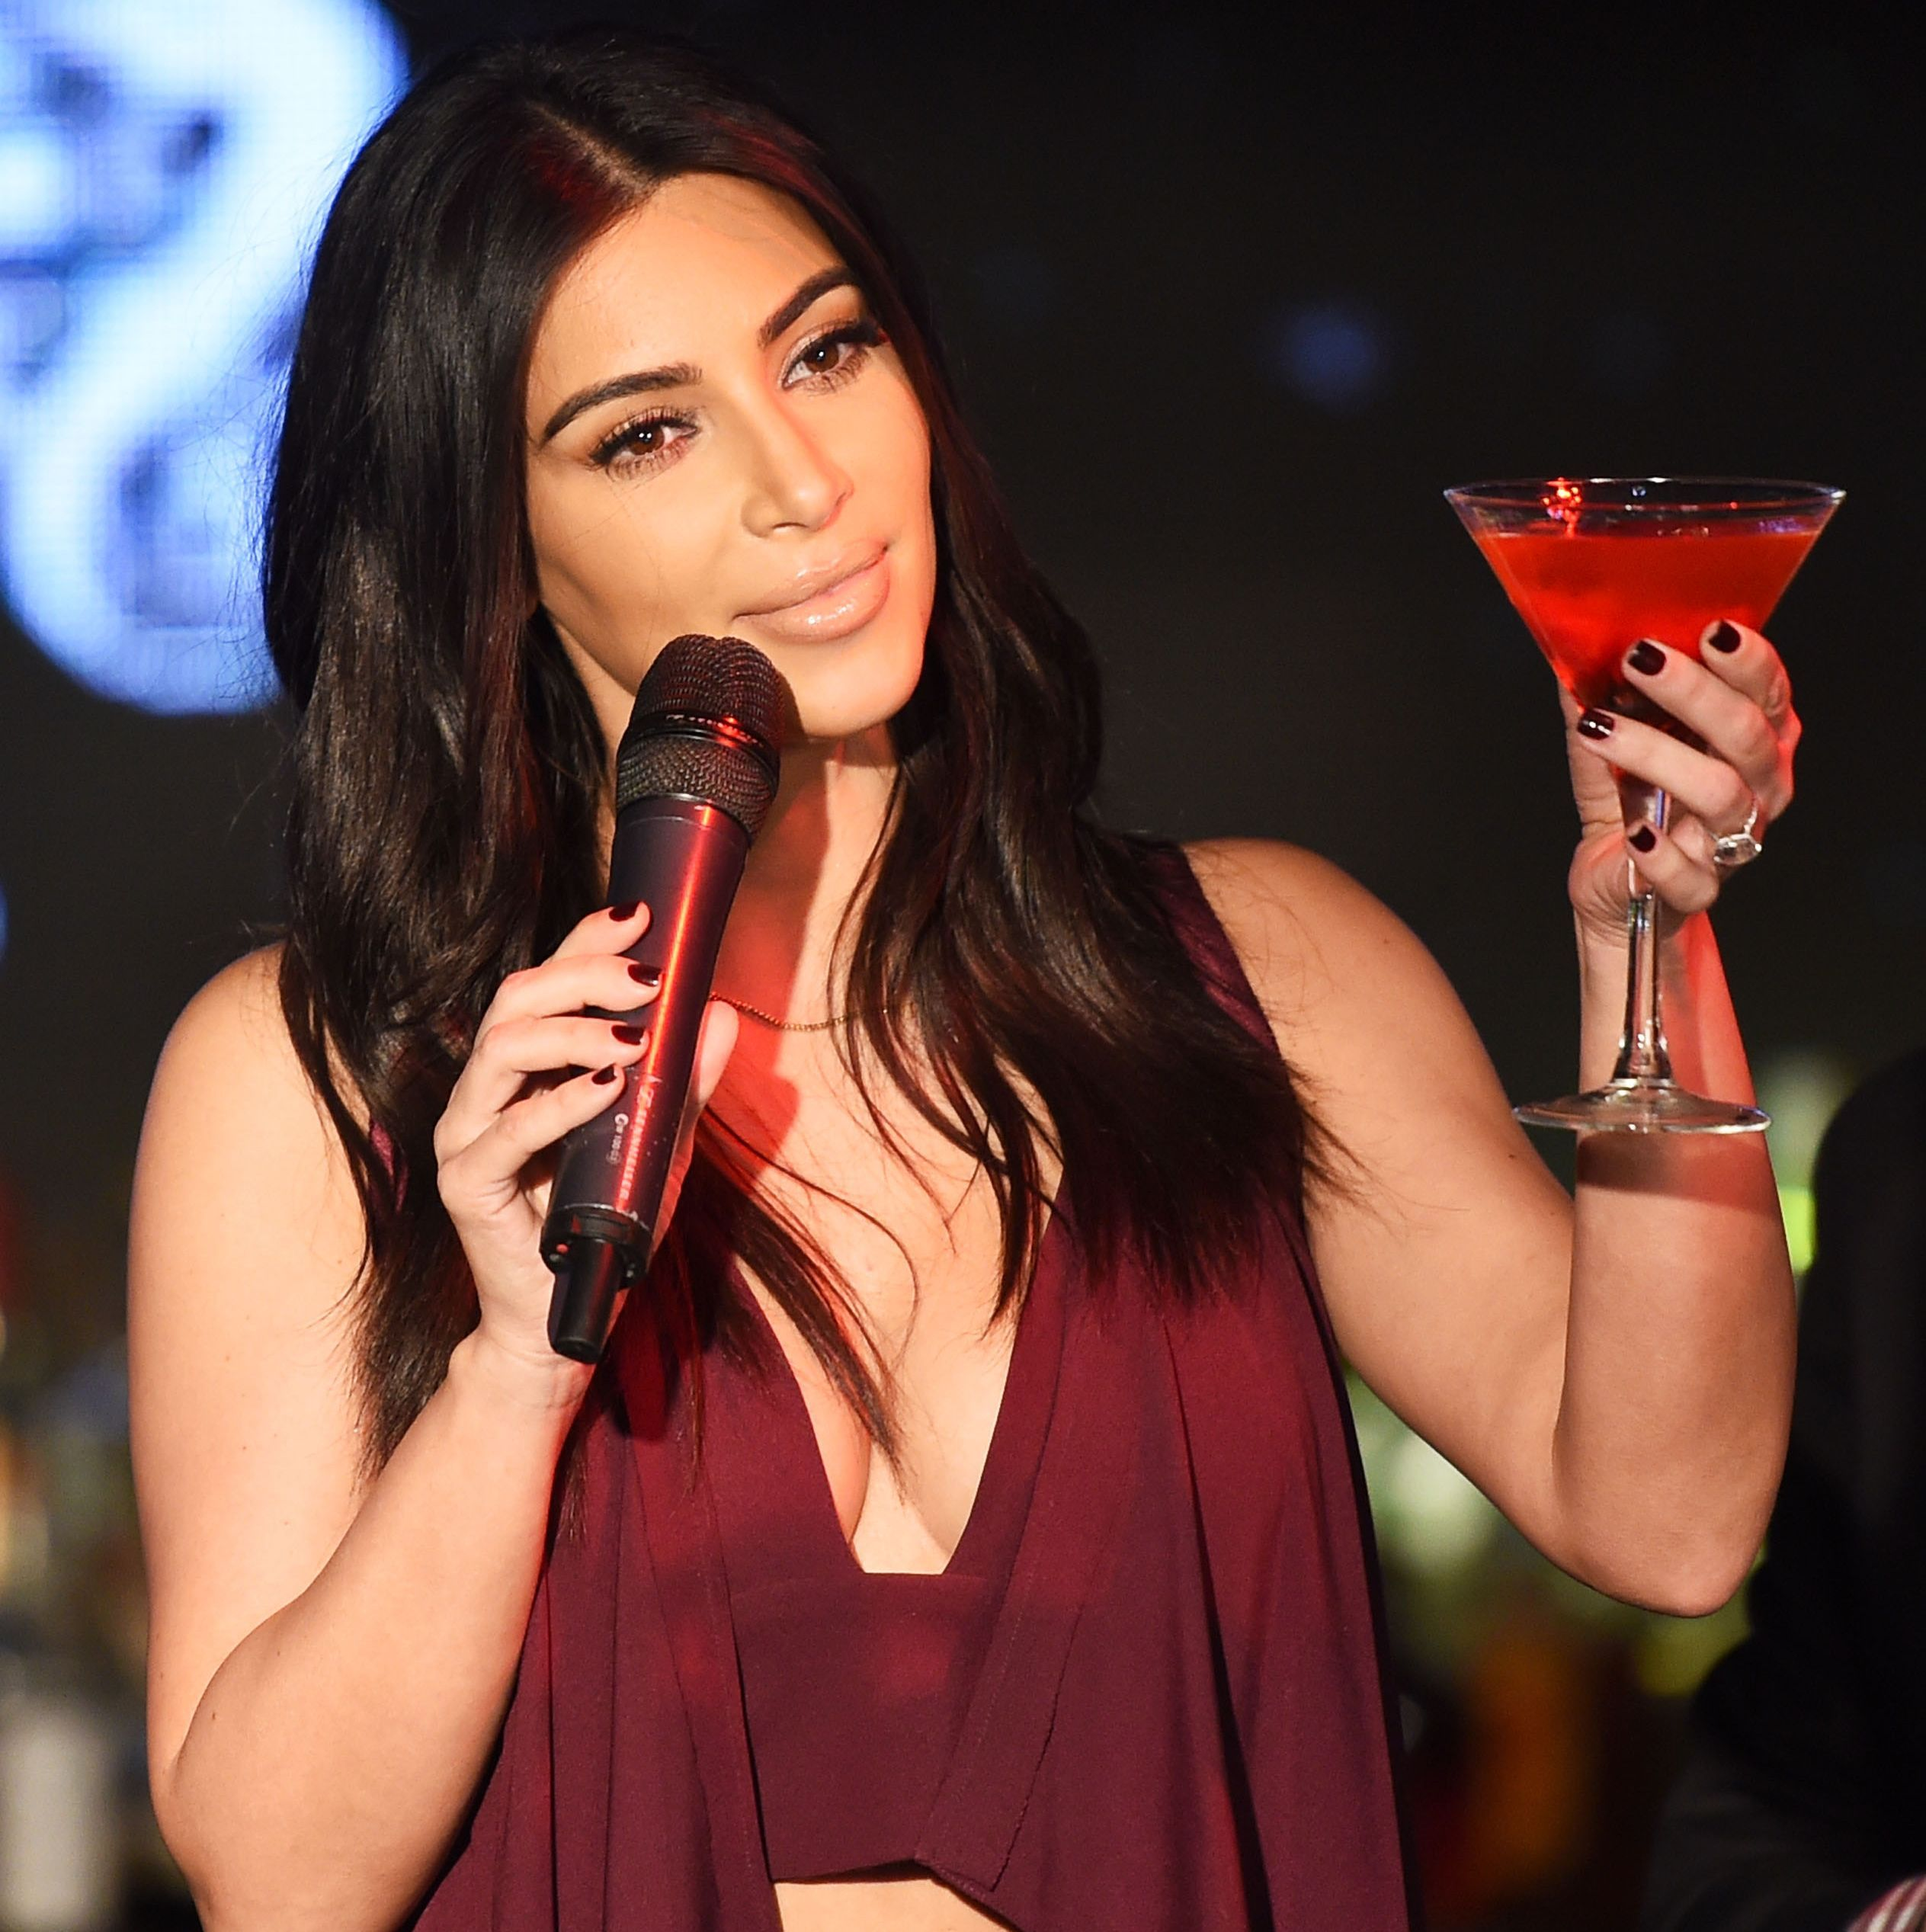 Kim Kardashian poses in orange as she promotes Sooo Fire